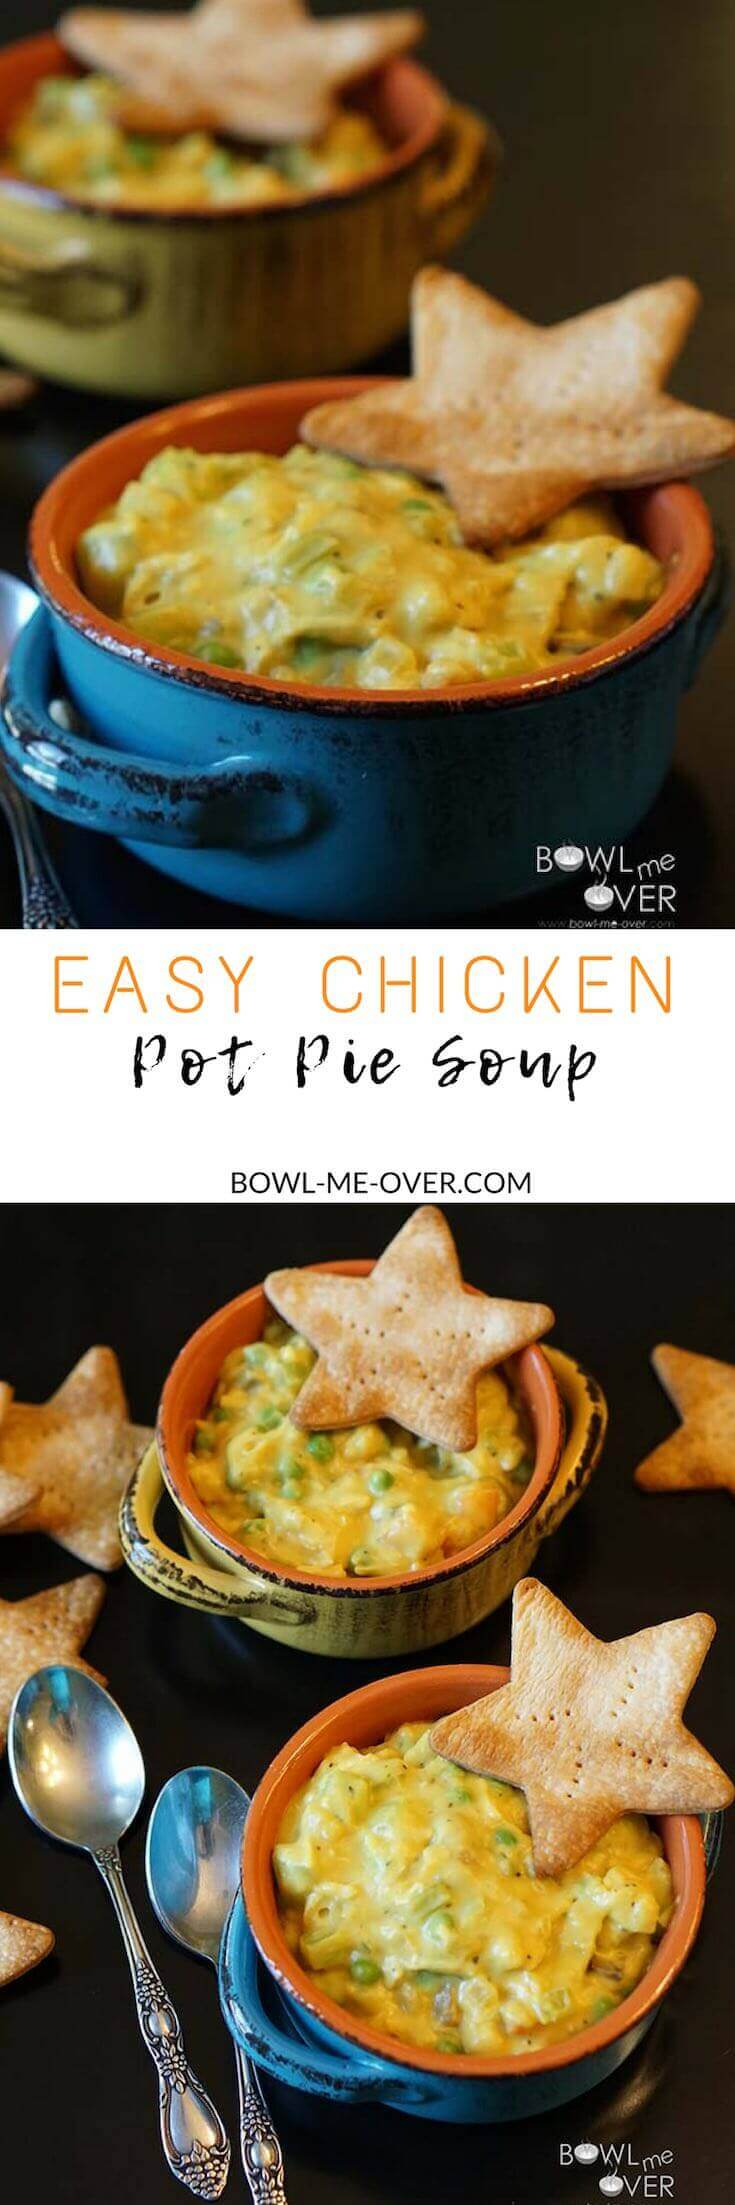 Chicken Pot Pie Soup is good food!